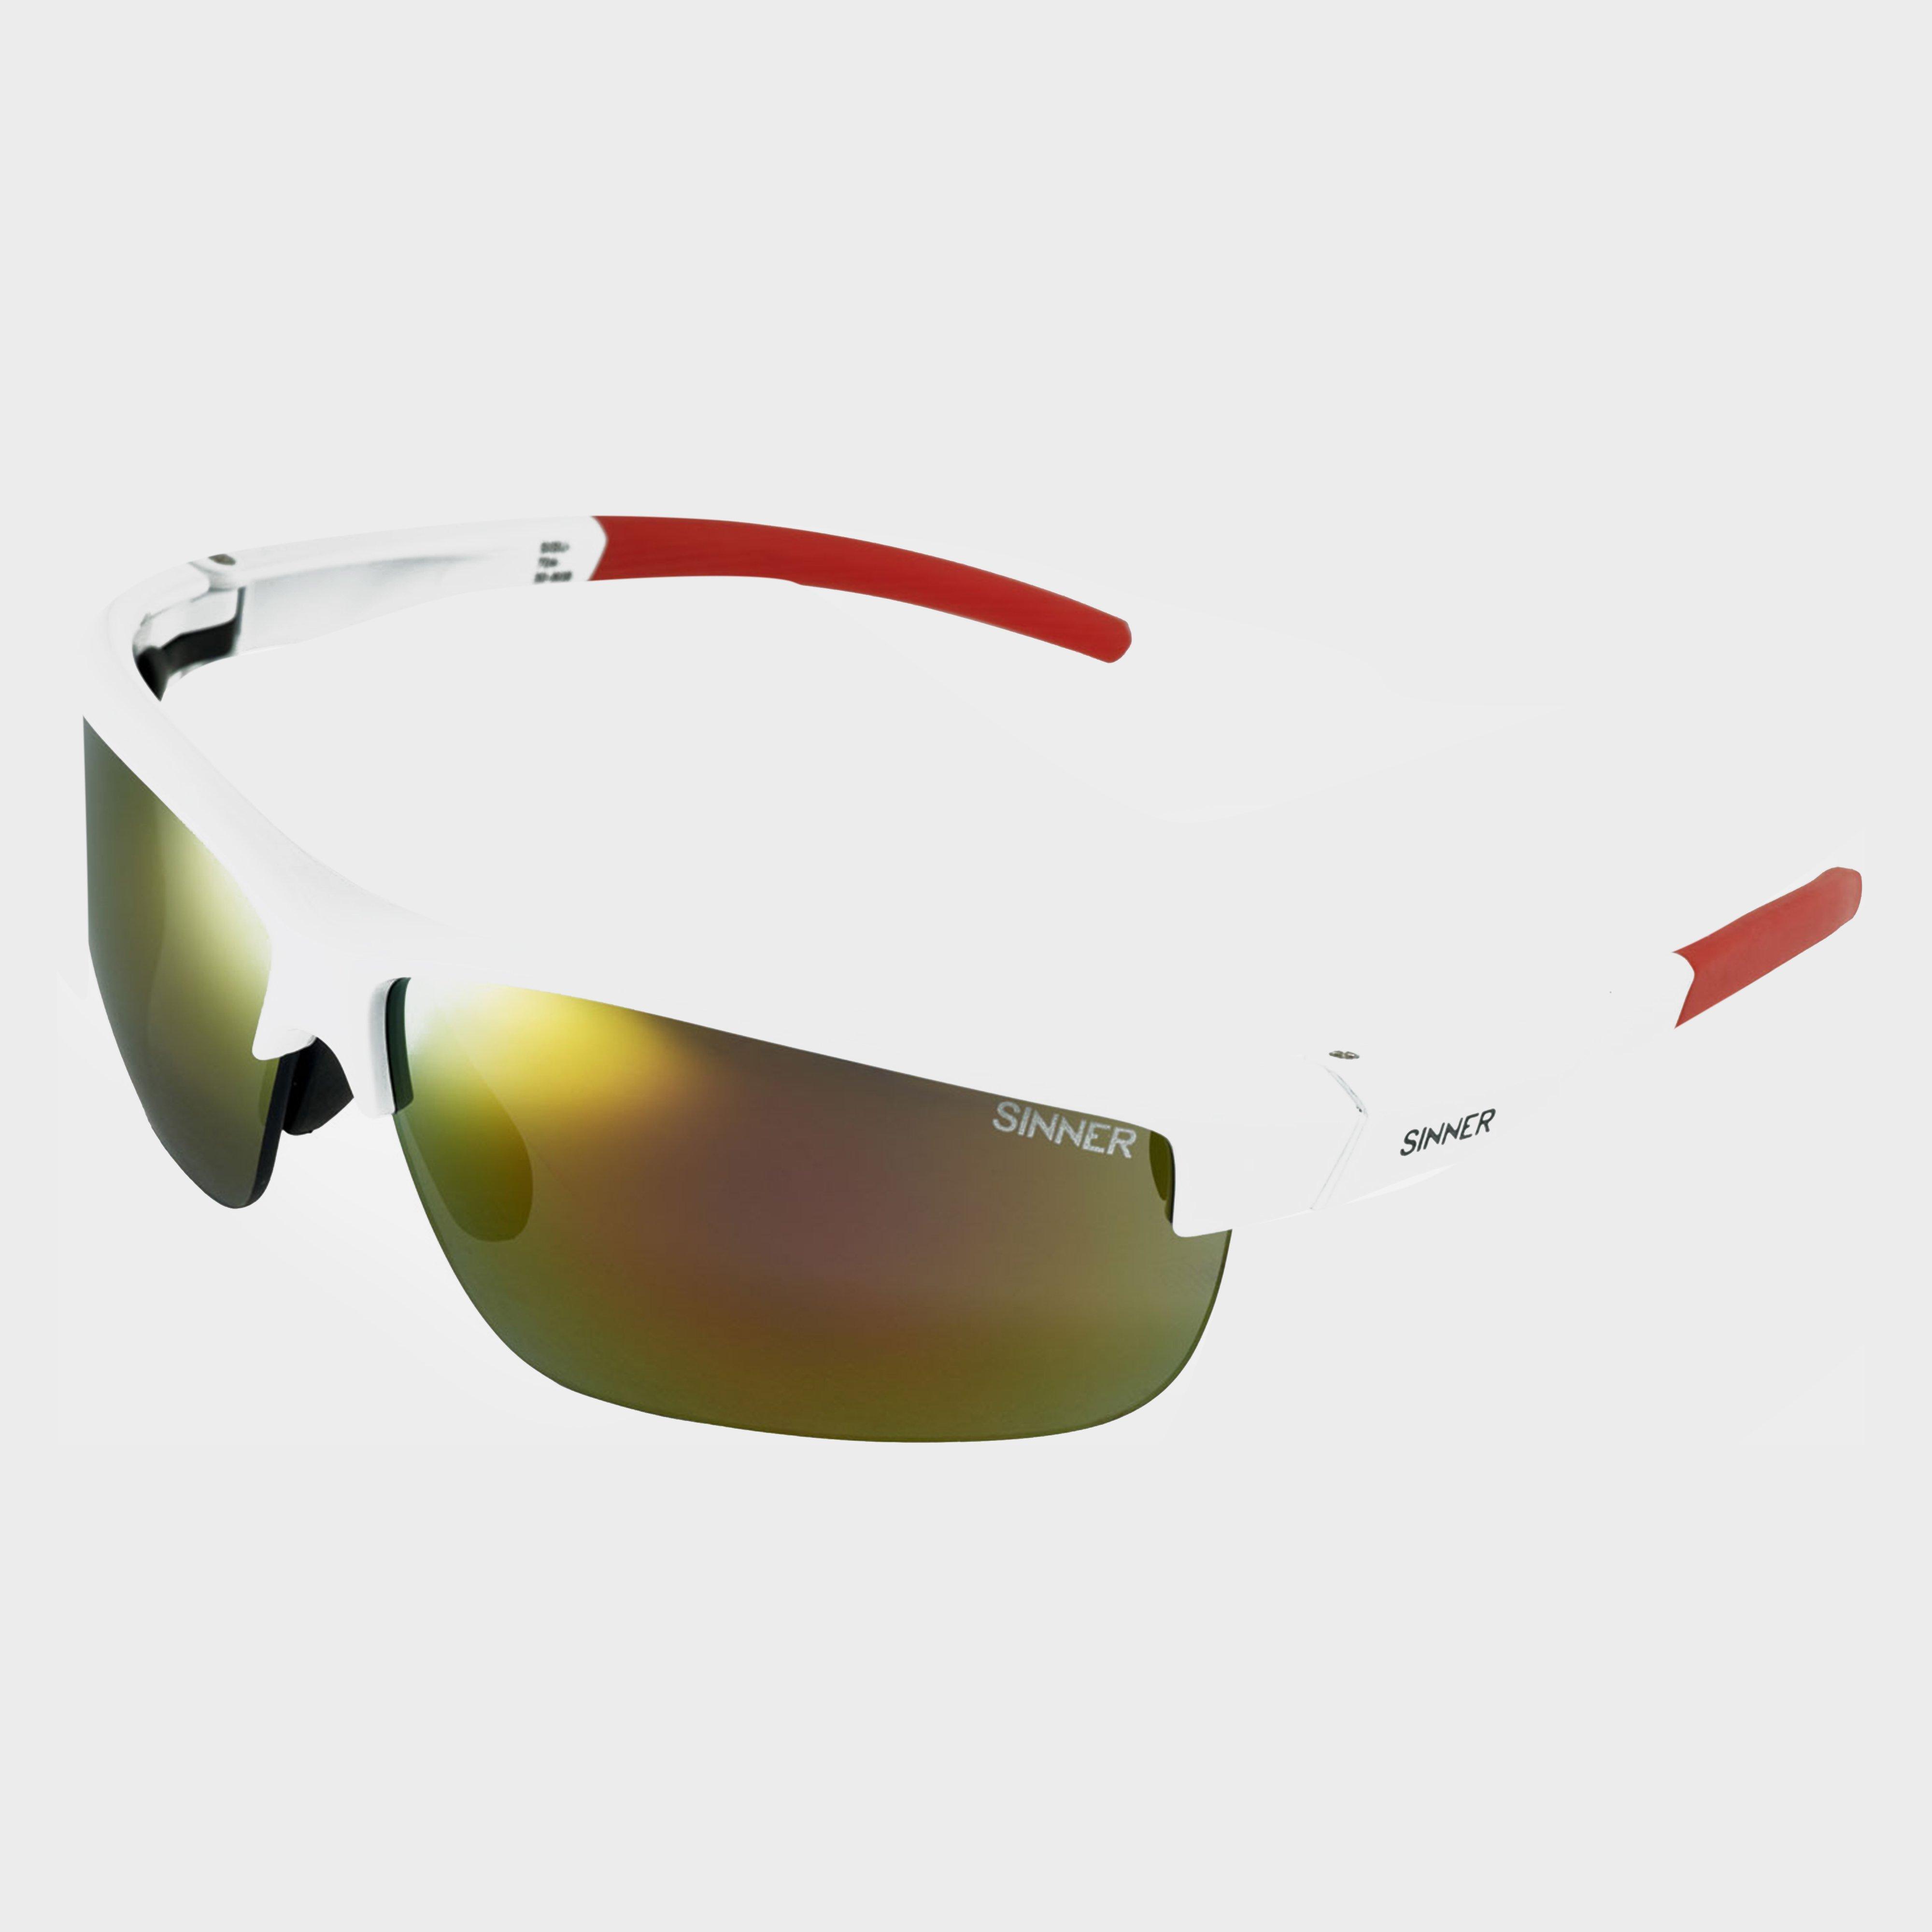 Sinner Antigua Sport Sunglasses - Multi/orn  Multi/orn